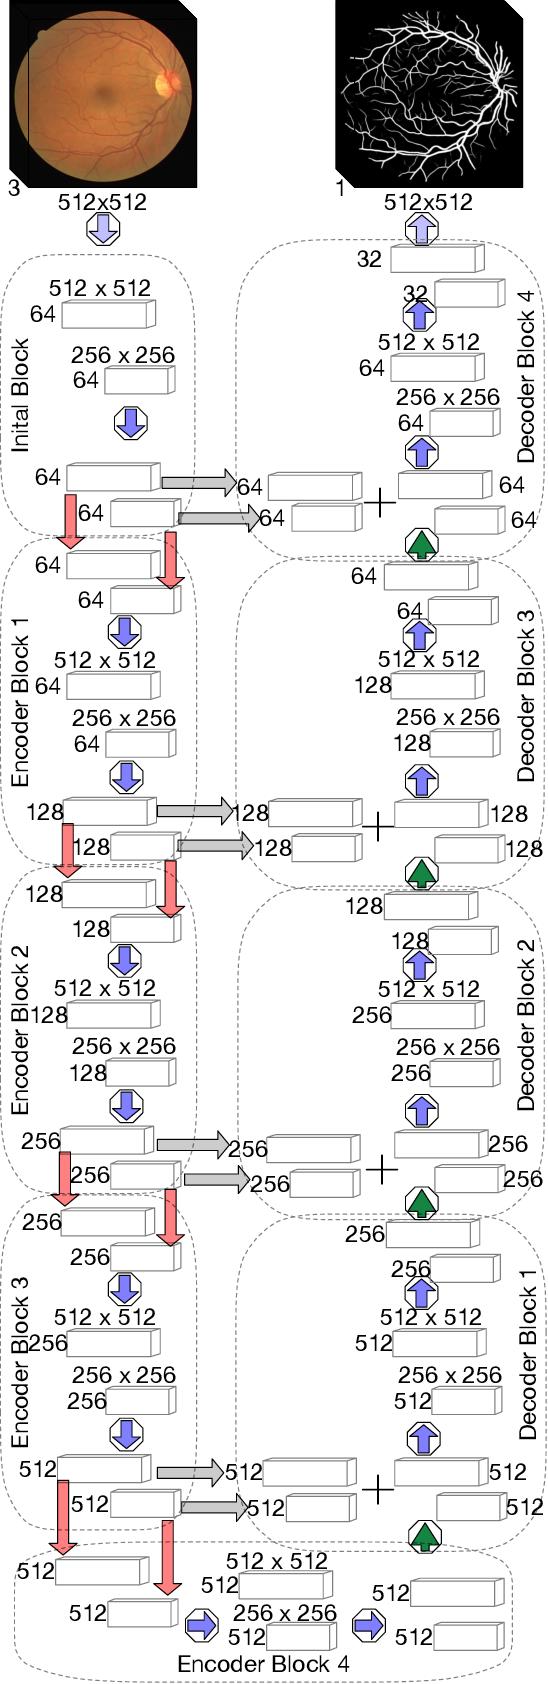 Figure 4 for Accurate Retinal Vessel Segmentation via Octave Convolution Neural Network